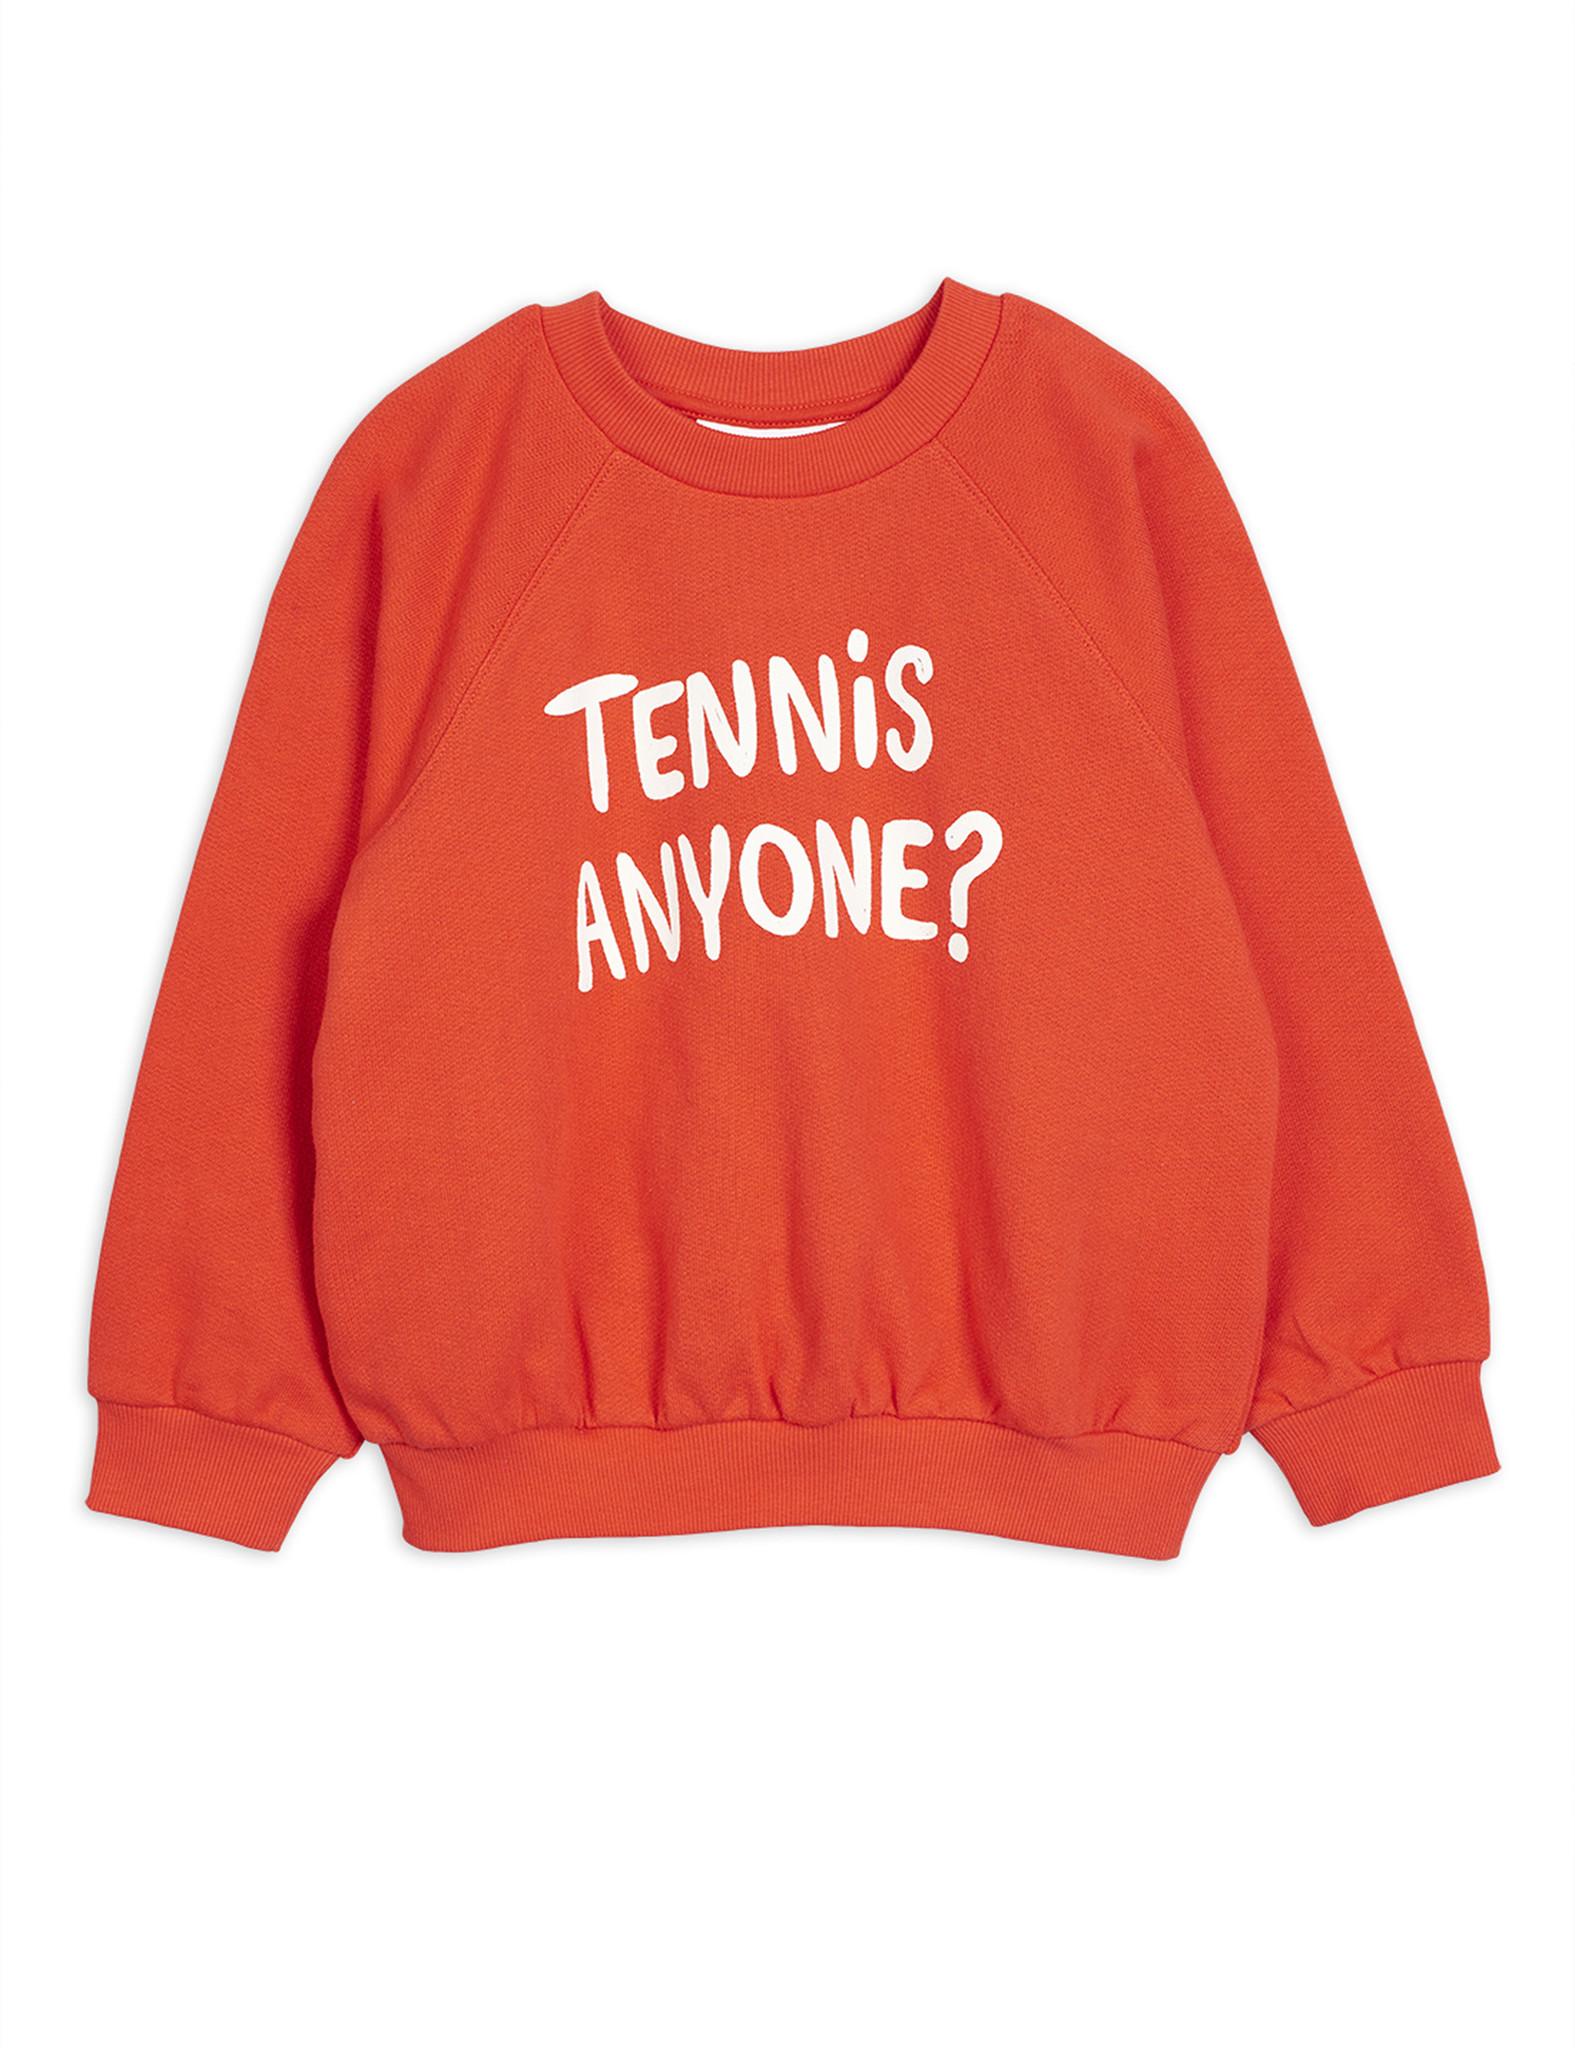 Tennis anyone sp sweatshirt - Red-1